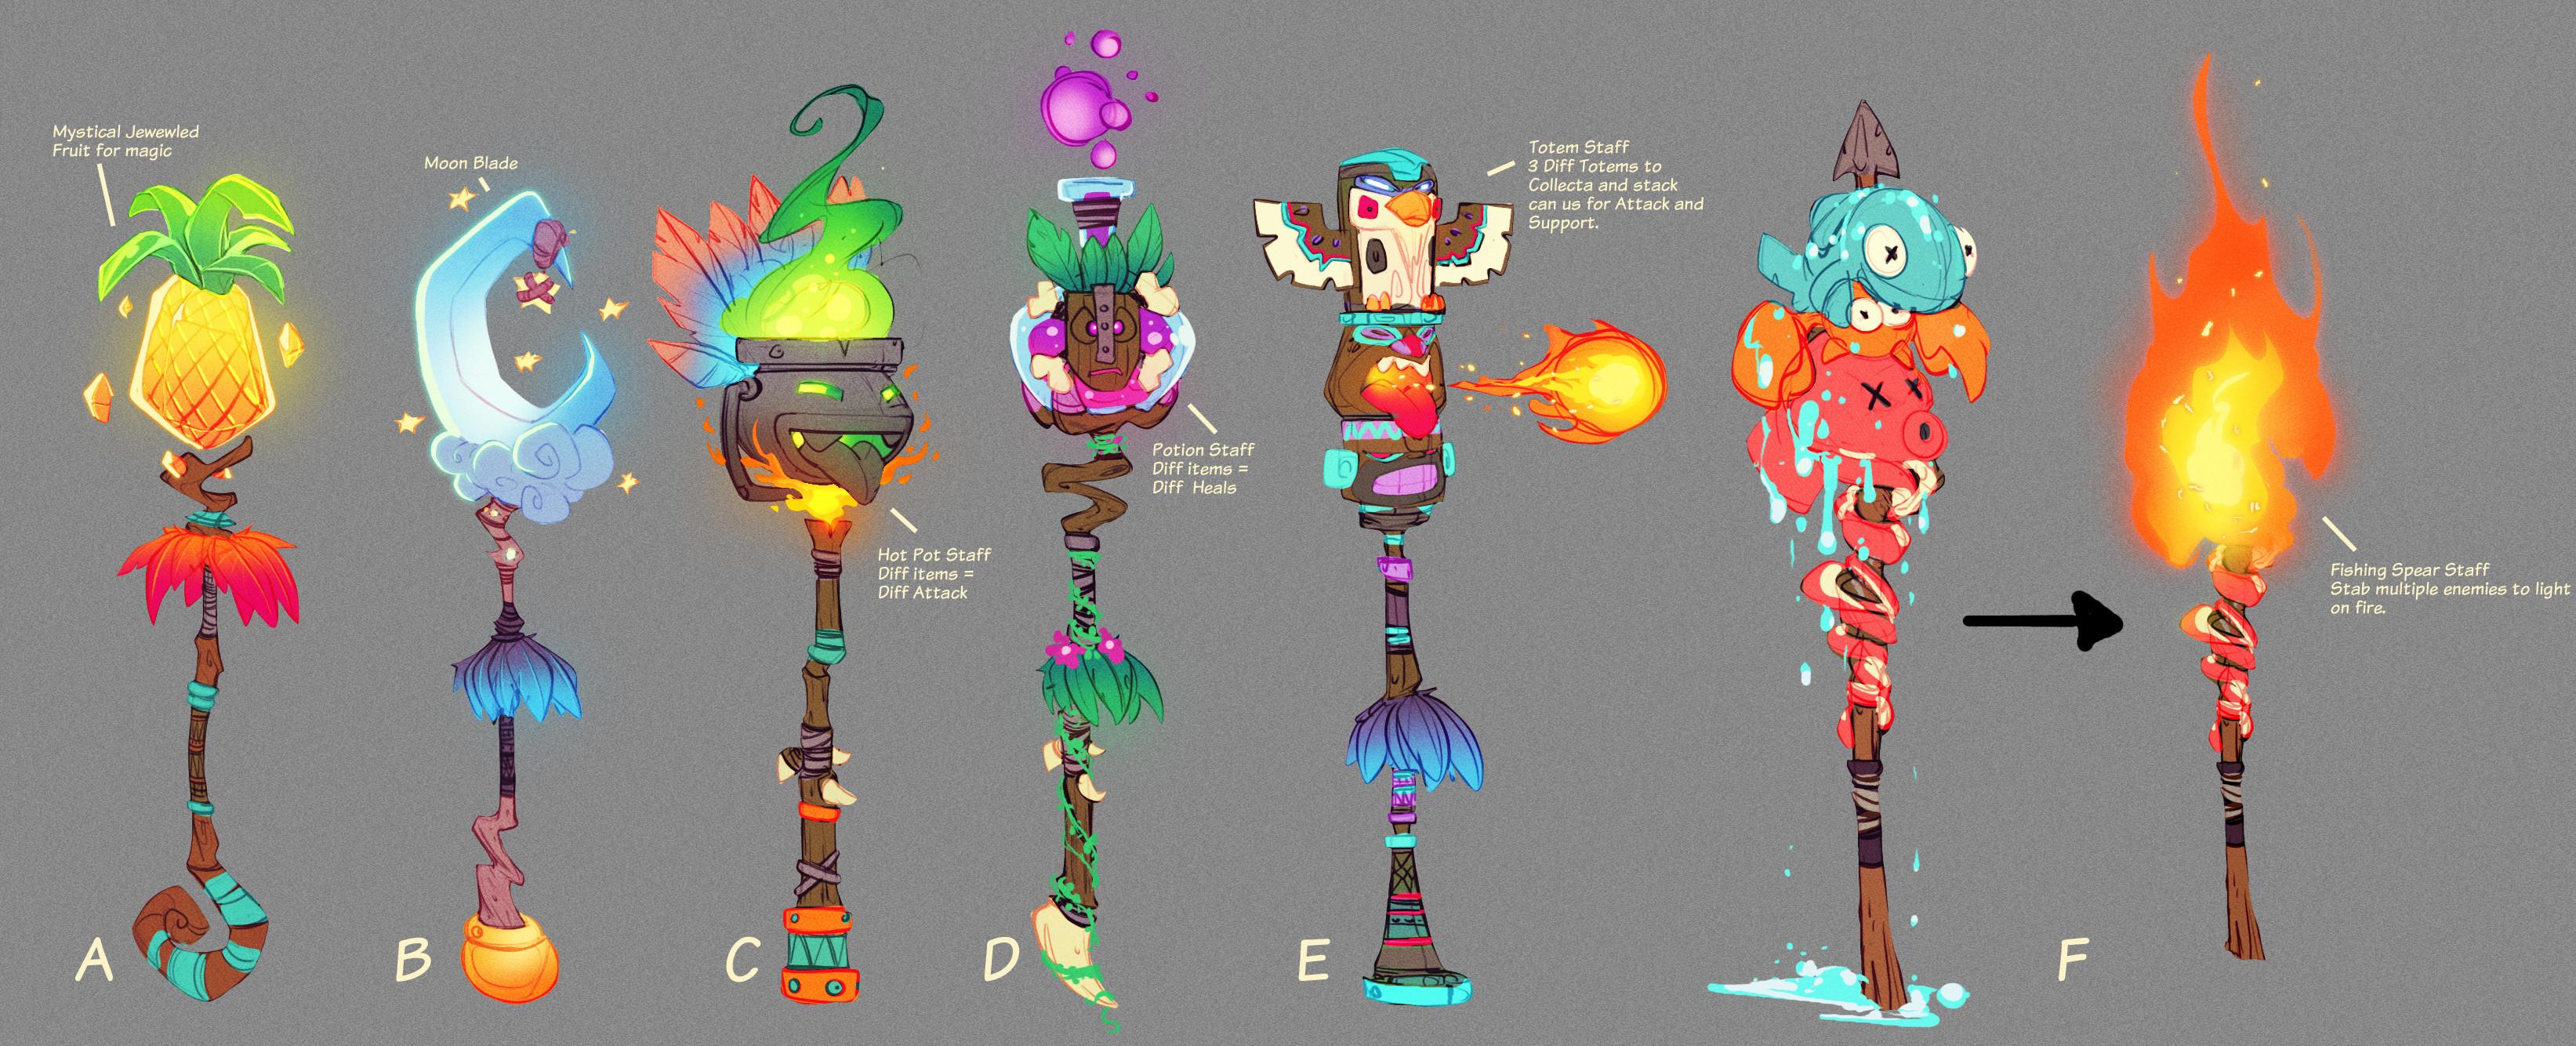 Early Crash 4 concept development: Papu Papu staff ideations.